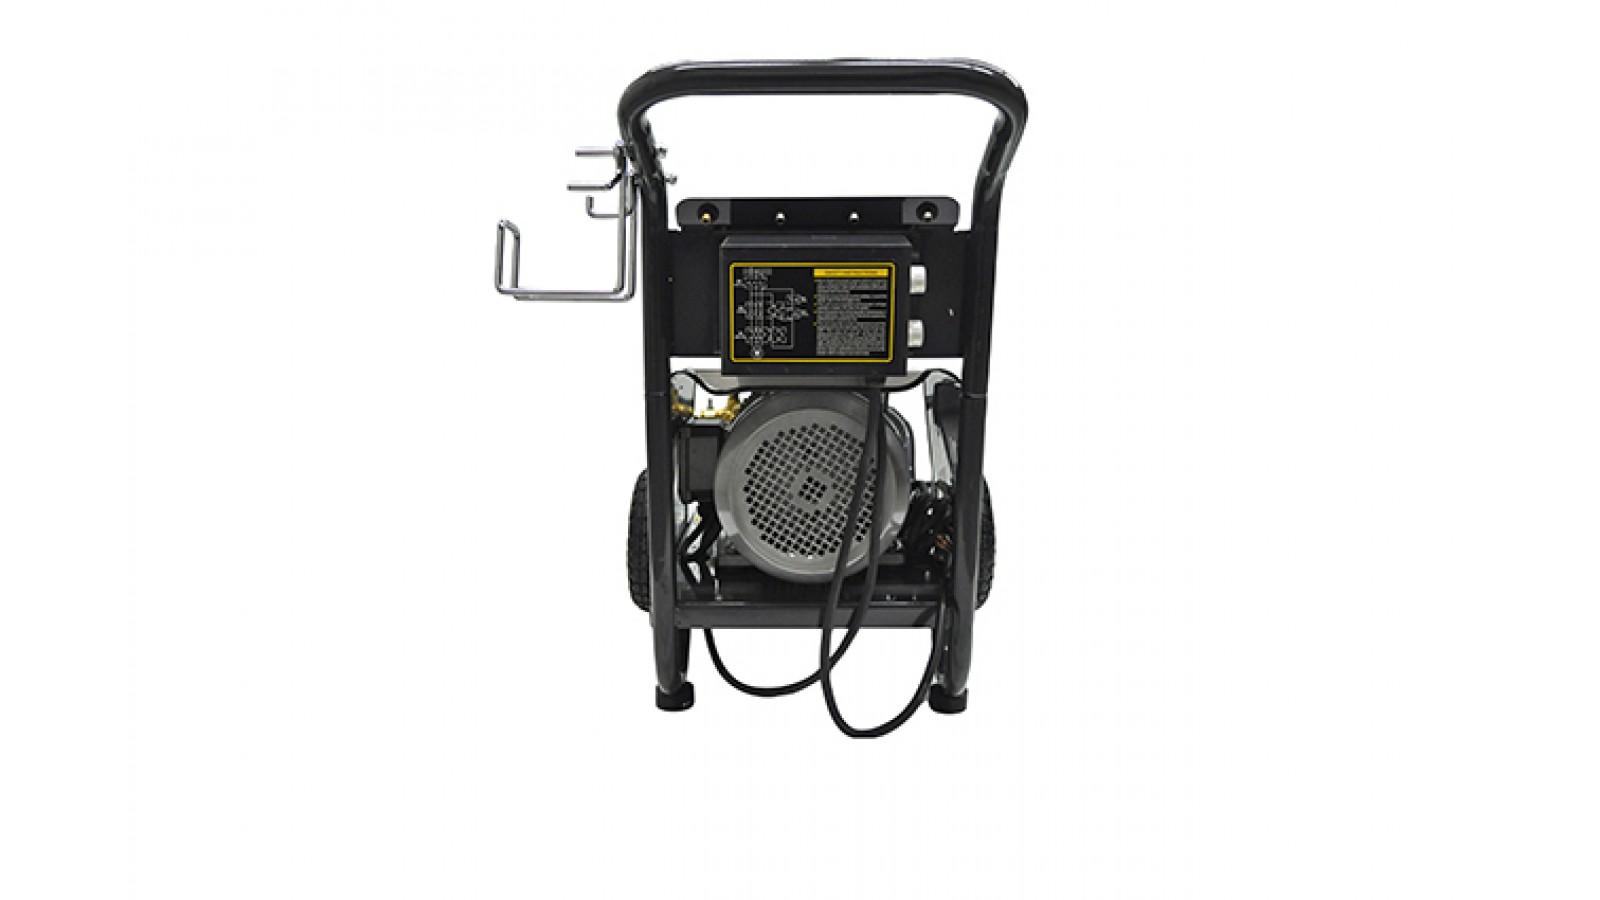 Idropulitrice alta pressione da 248bar